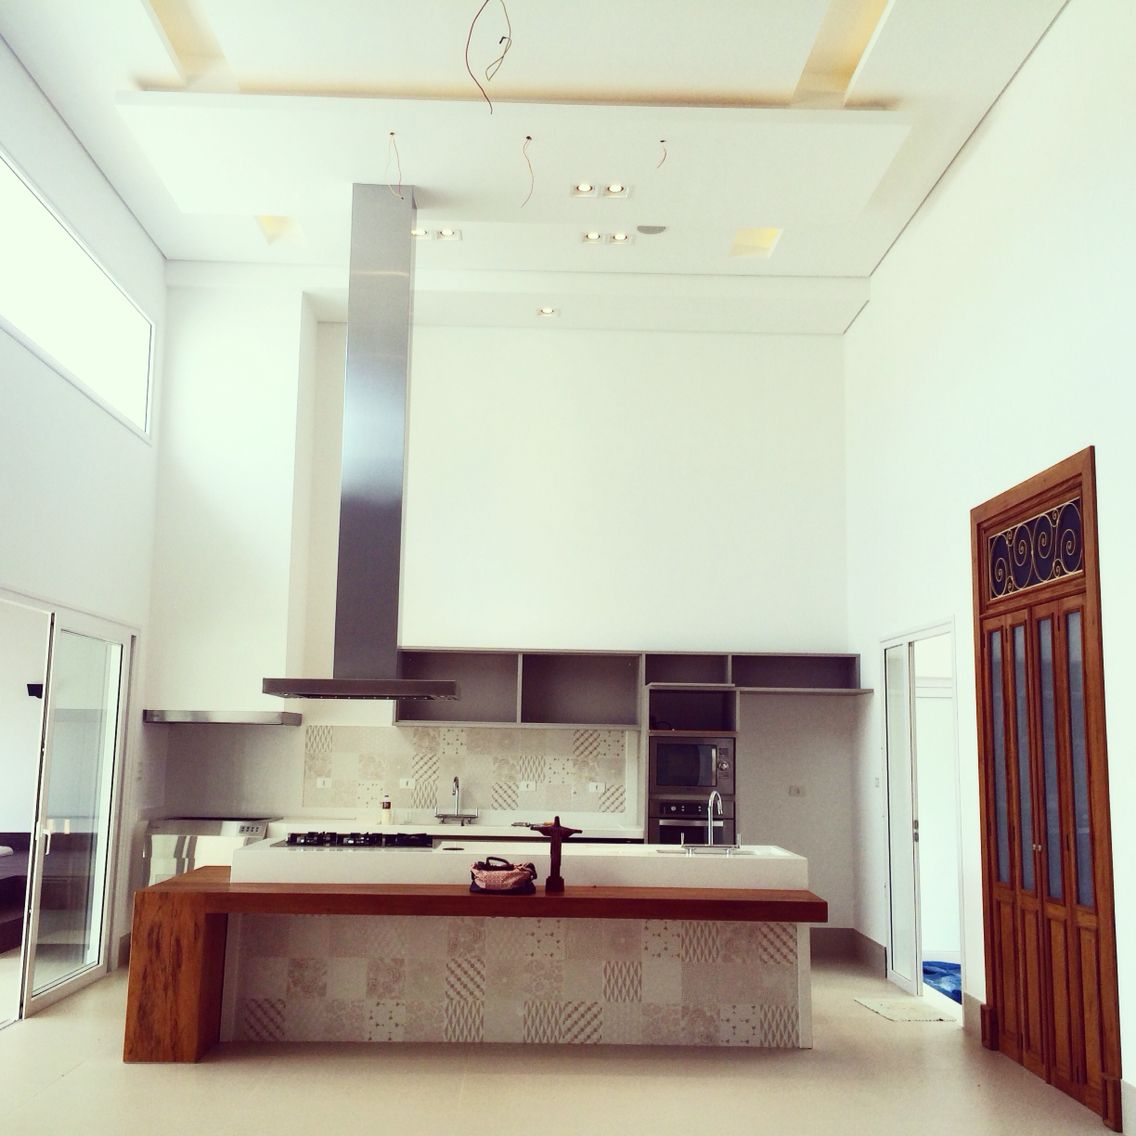 Cozinha_Residencia_BO!!! #decor #desing #braziliandesign #architecture #projetonosso #davidnatto #fernandasantoro #santoroarquitetura